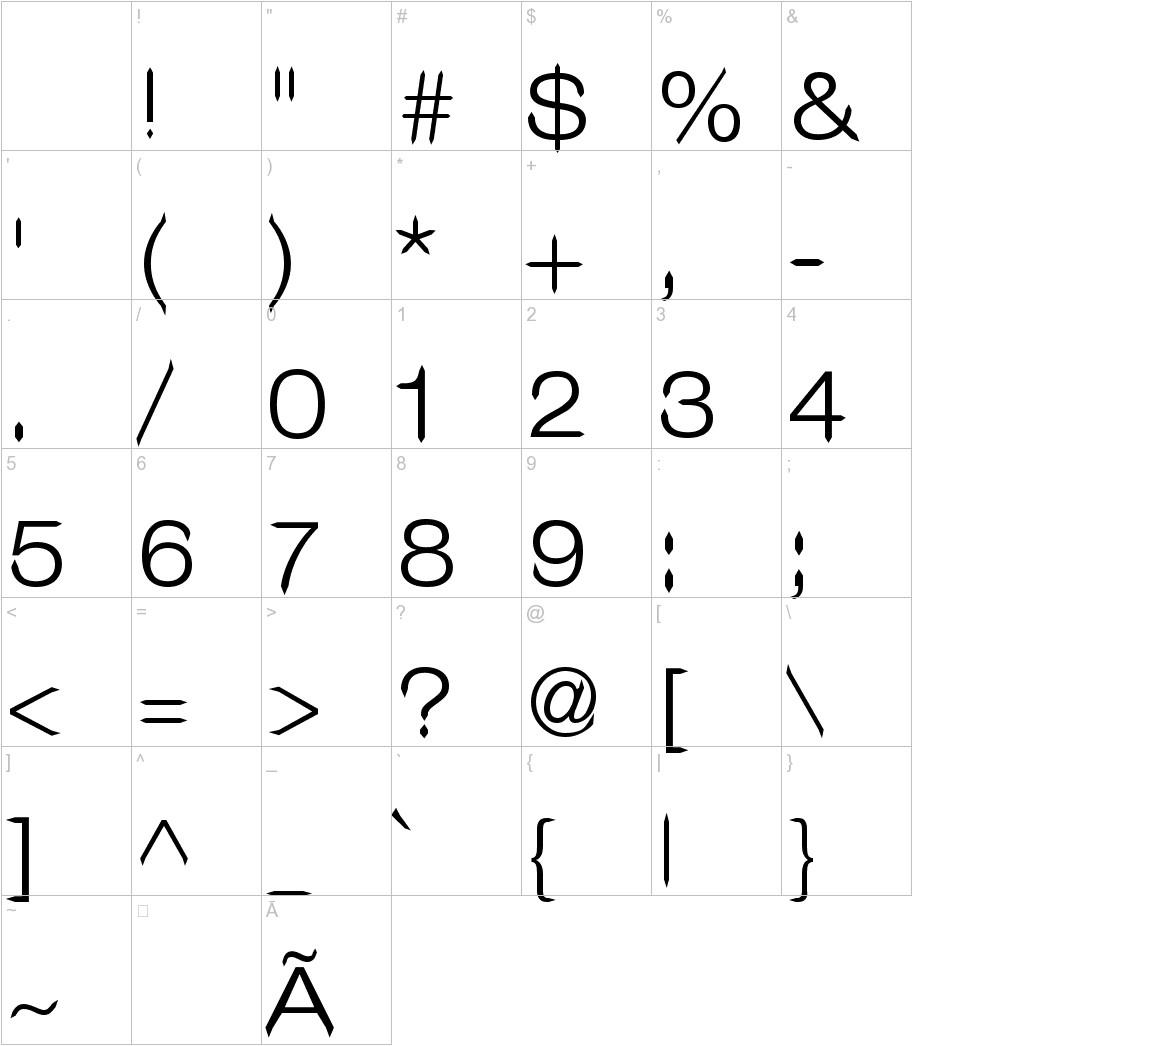 Leo Arrow Sans Serif characters